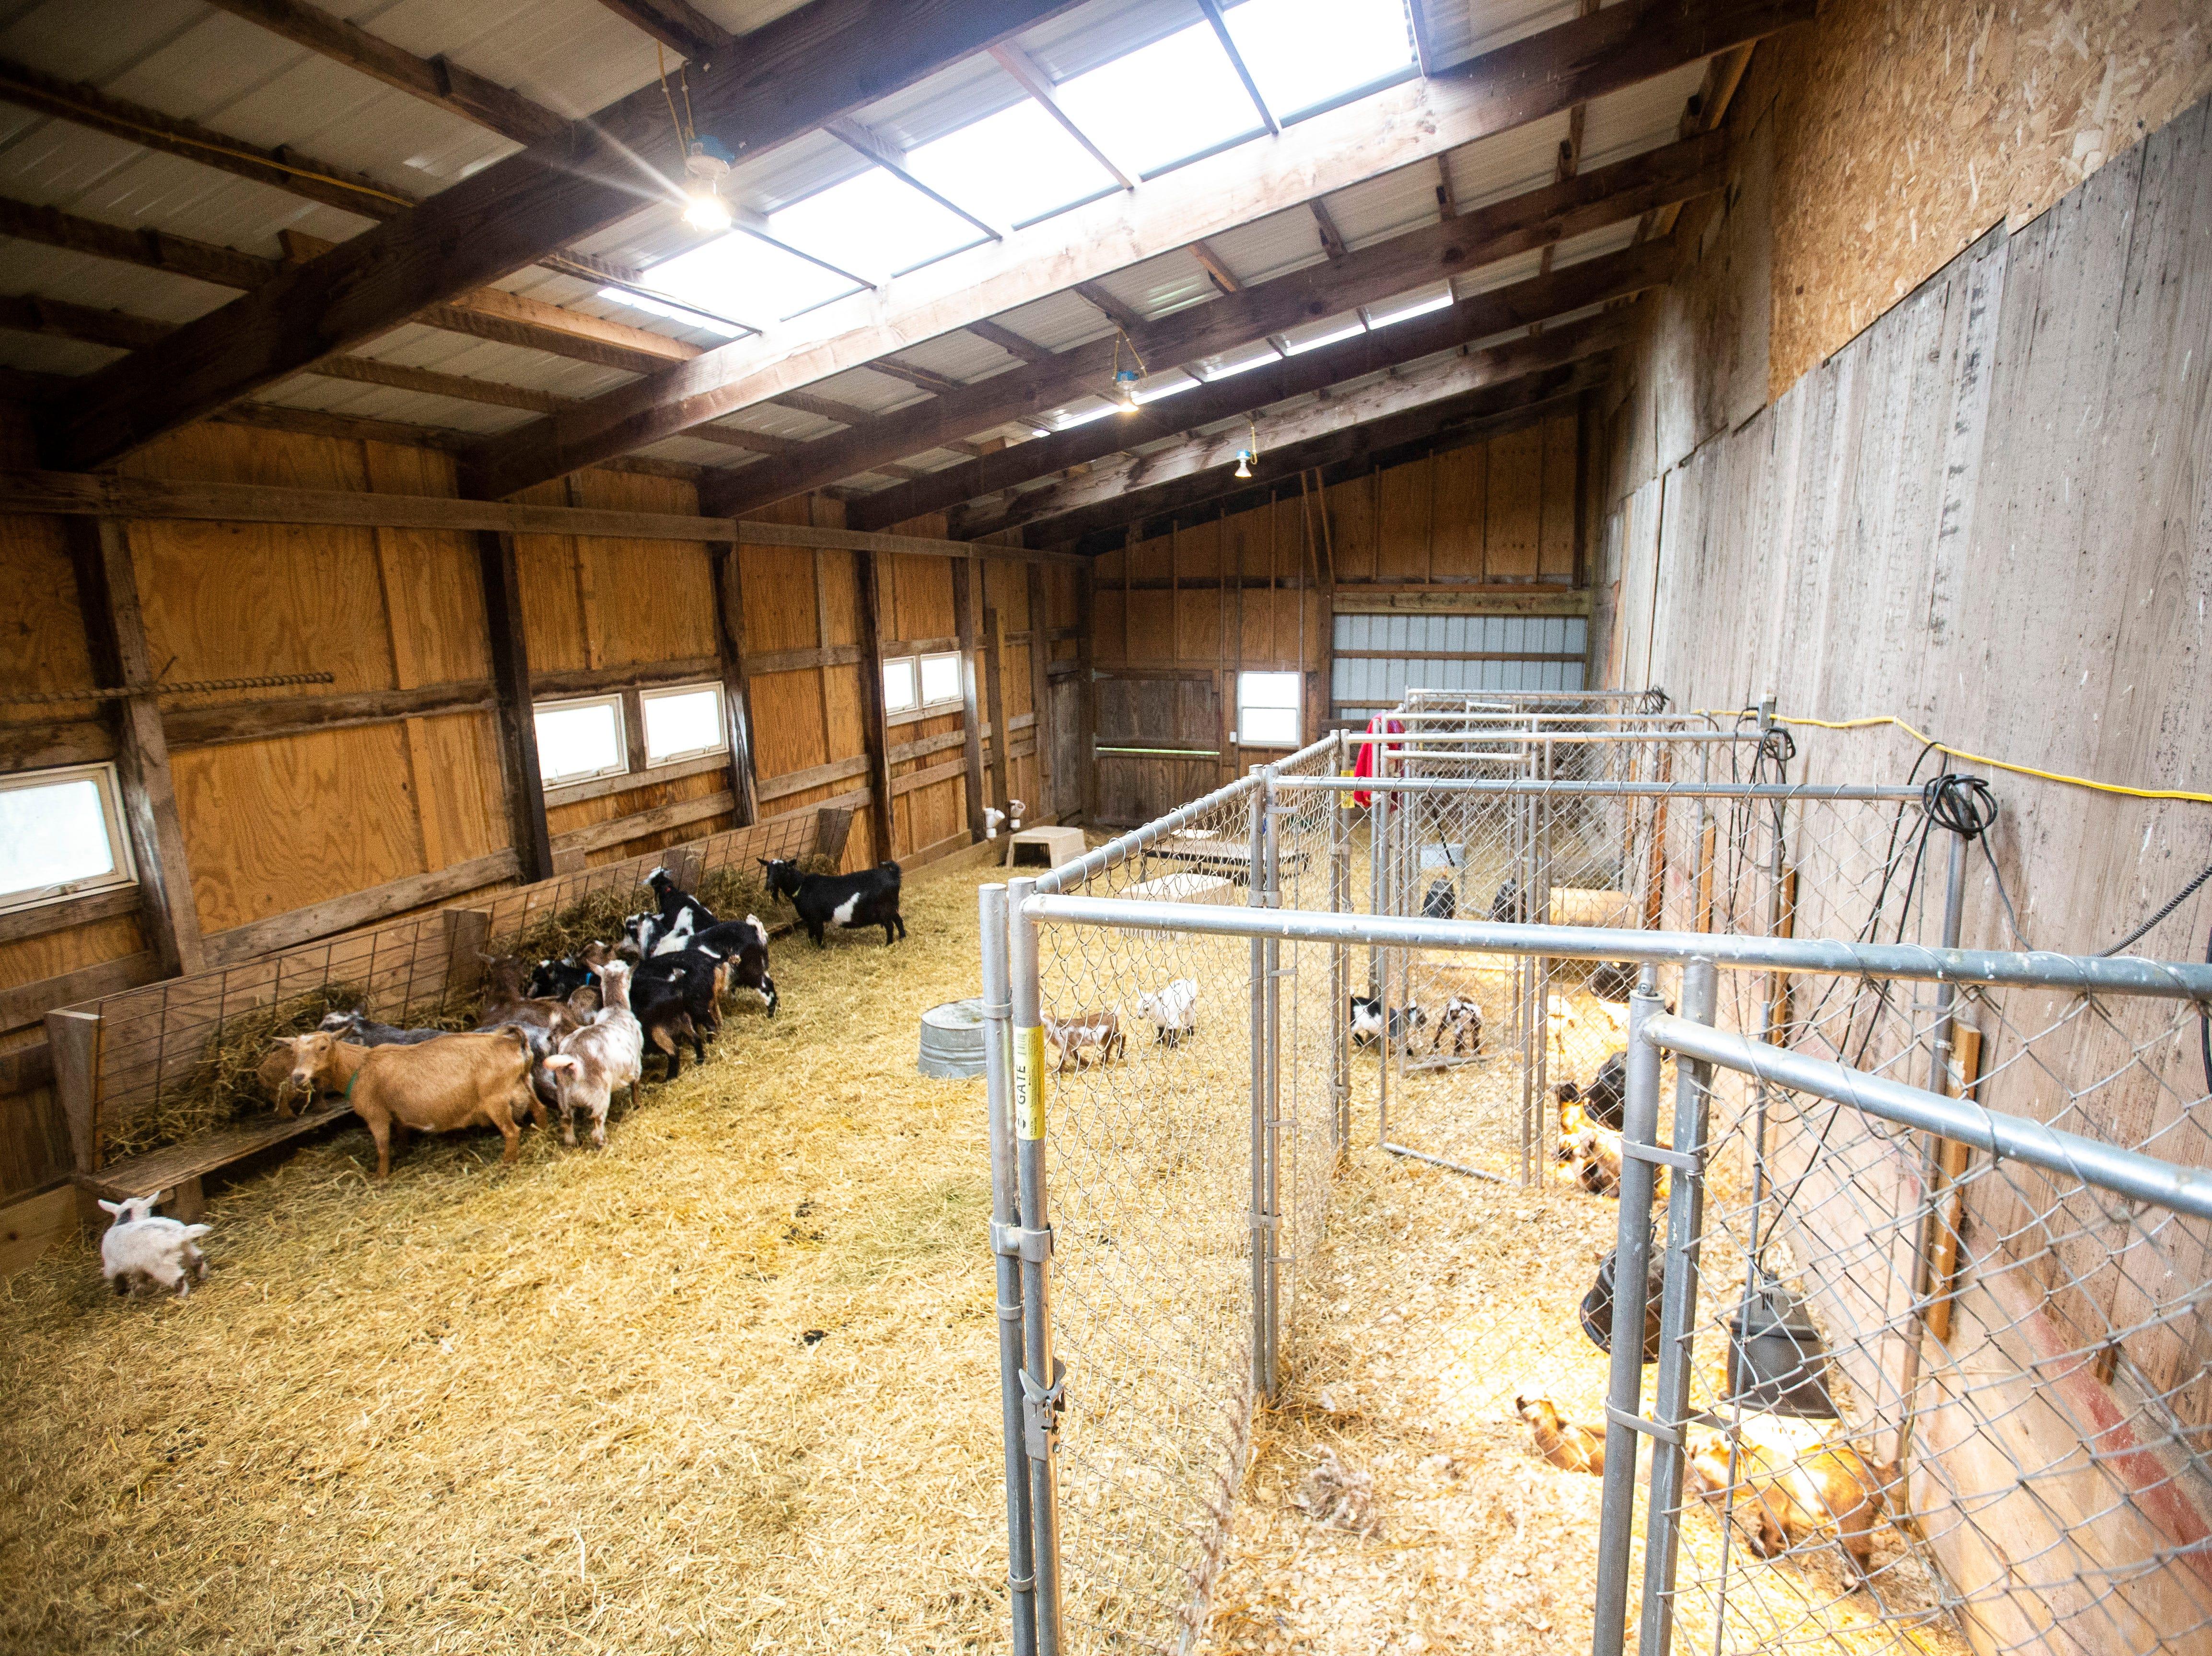 Dairy goats graze on Thursday, April 11, 2019, at Lucky Star Farm in Iowa City, Iowa.